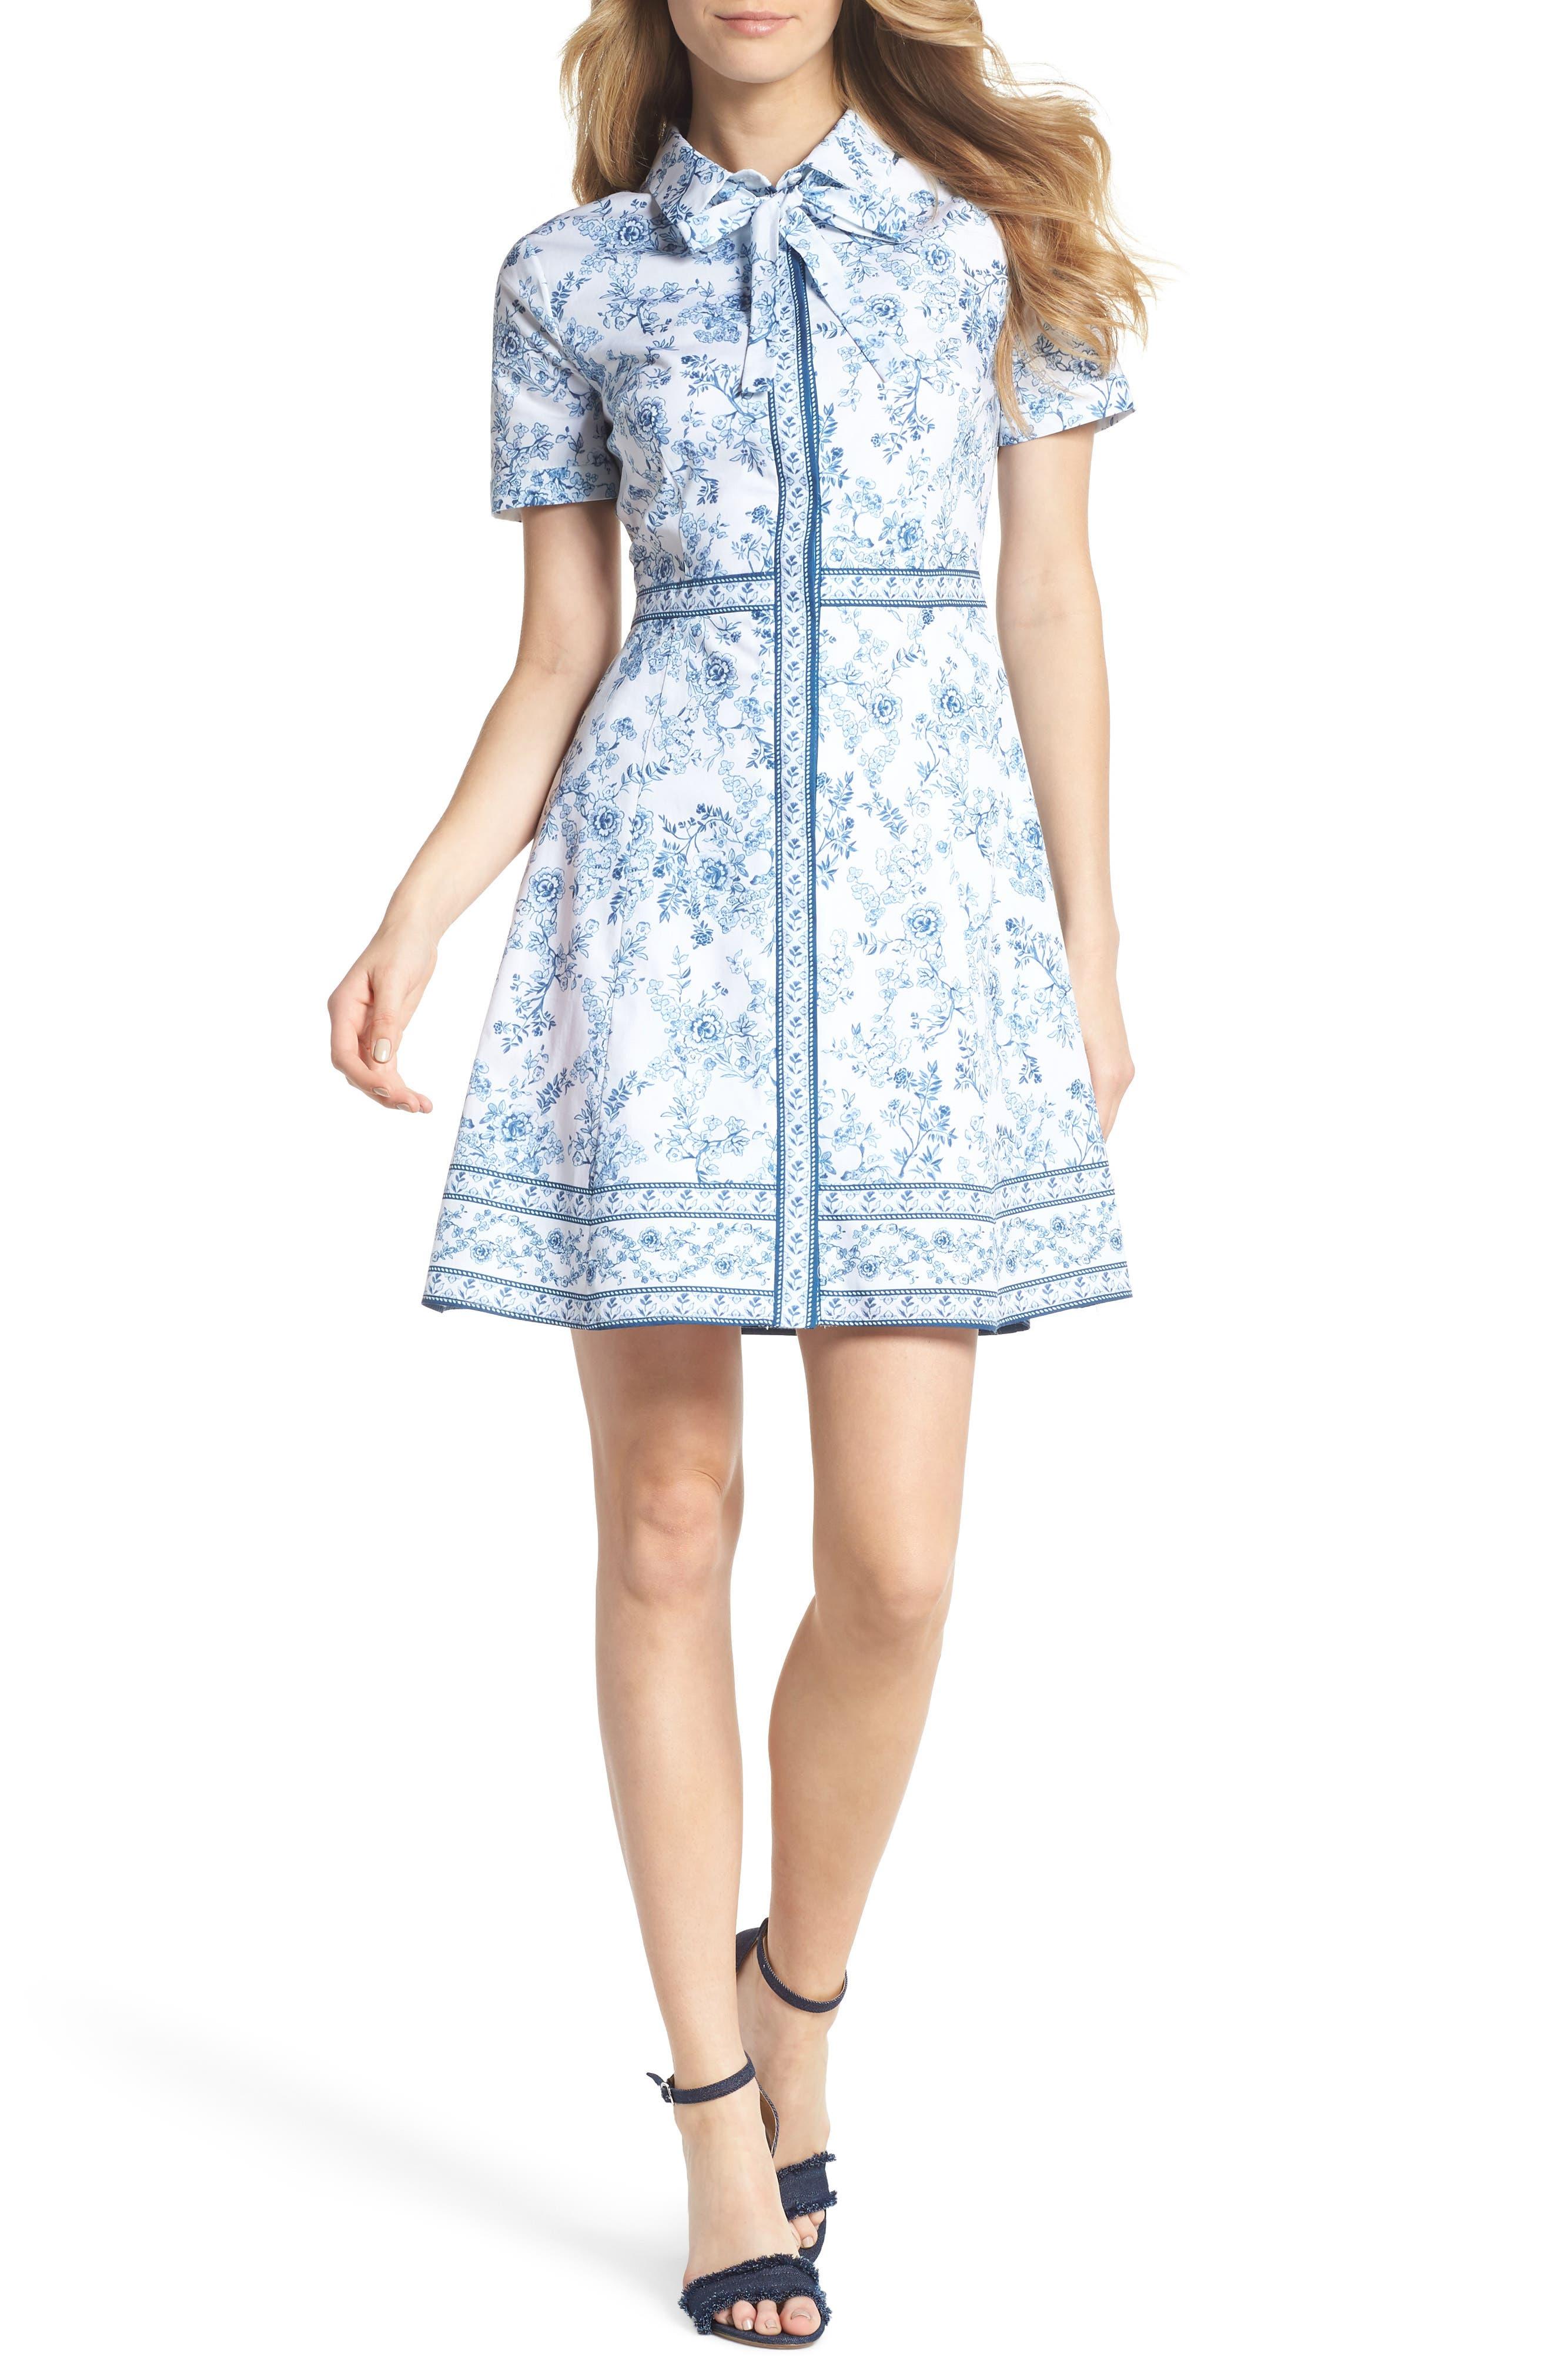 Darla Cotton Toile Shirtdress,                             Main thumbnail 1, color,                             415